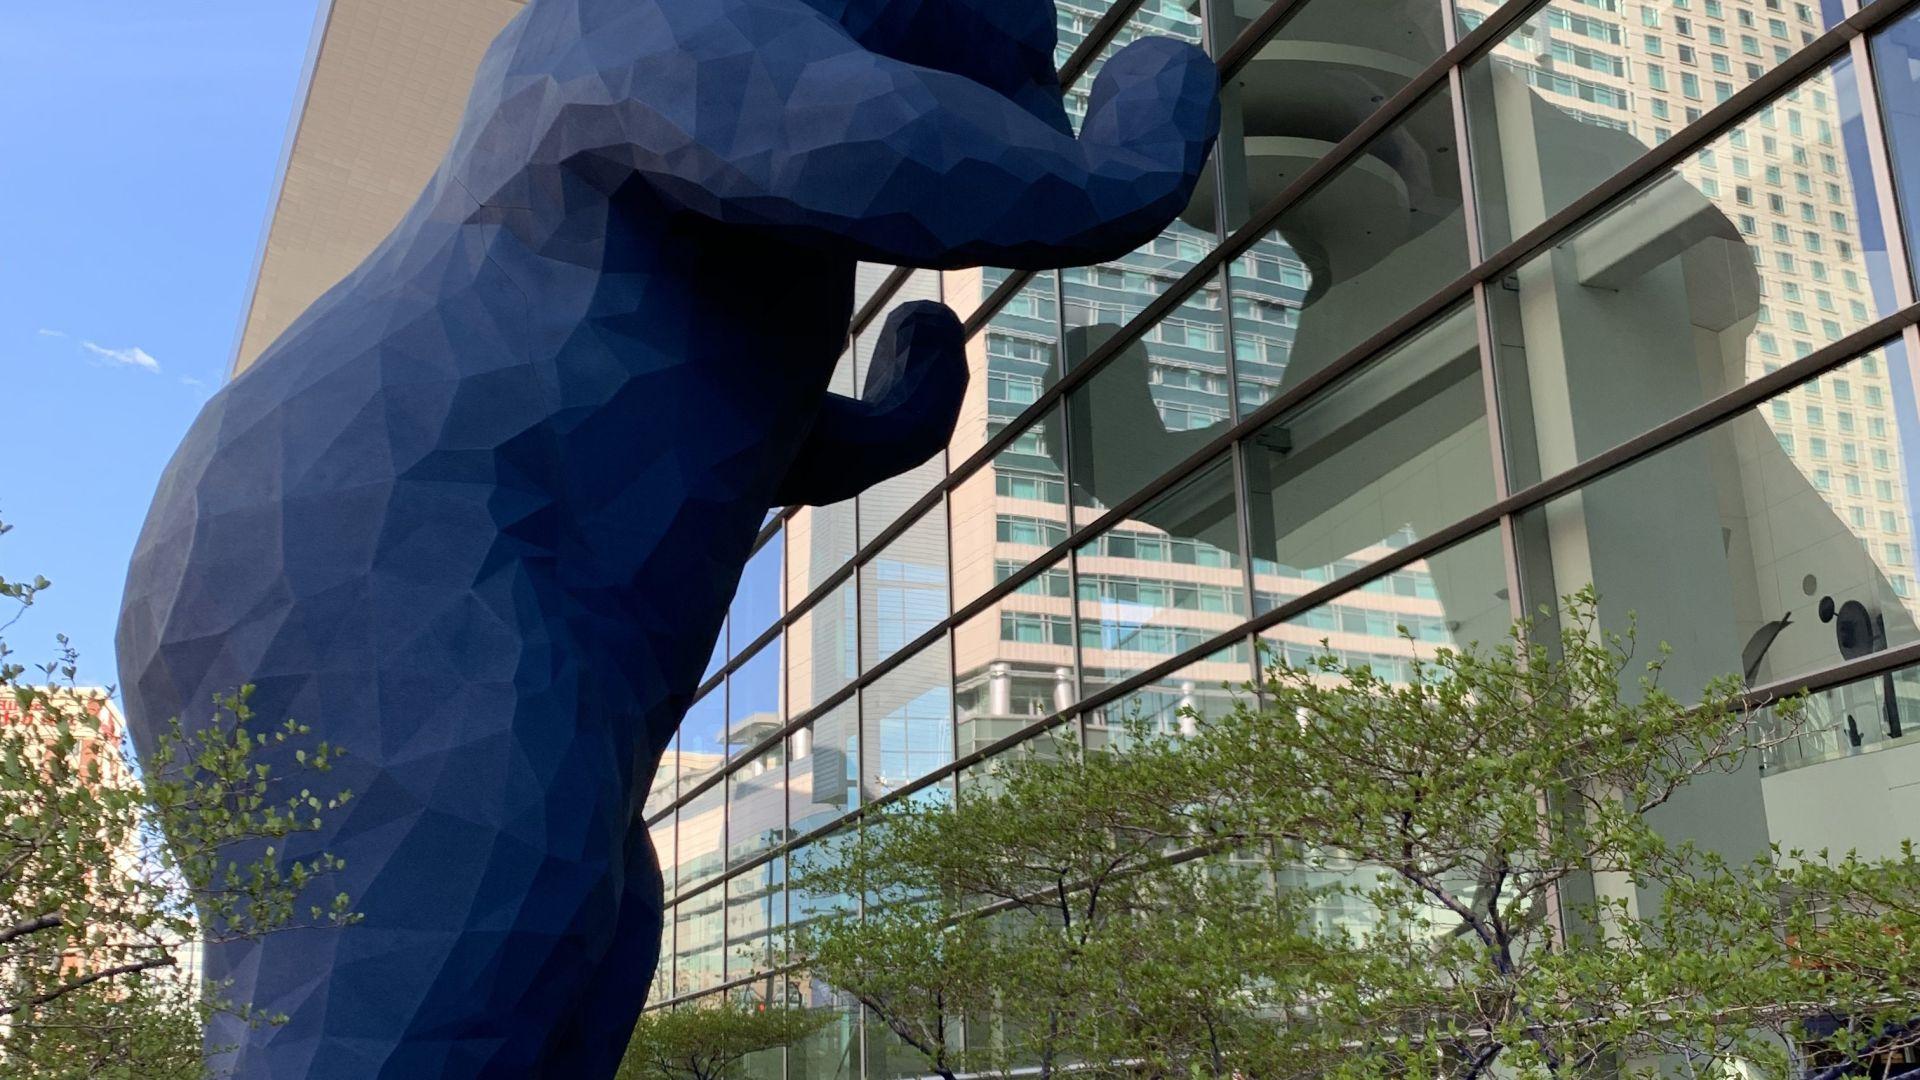 A blue bear statue peeking into the Colorado Convention Center in Denver.